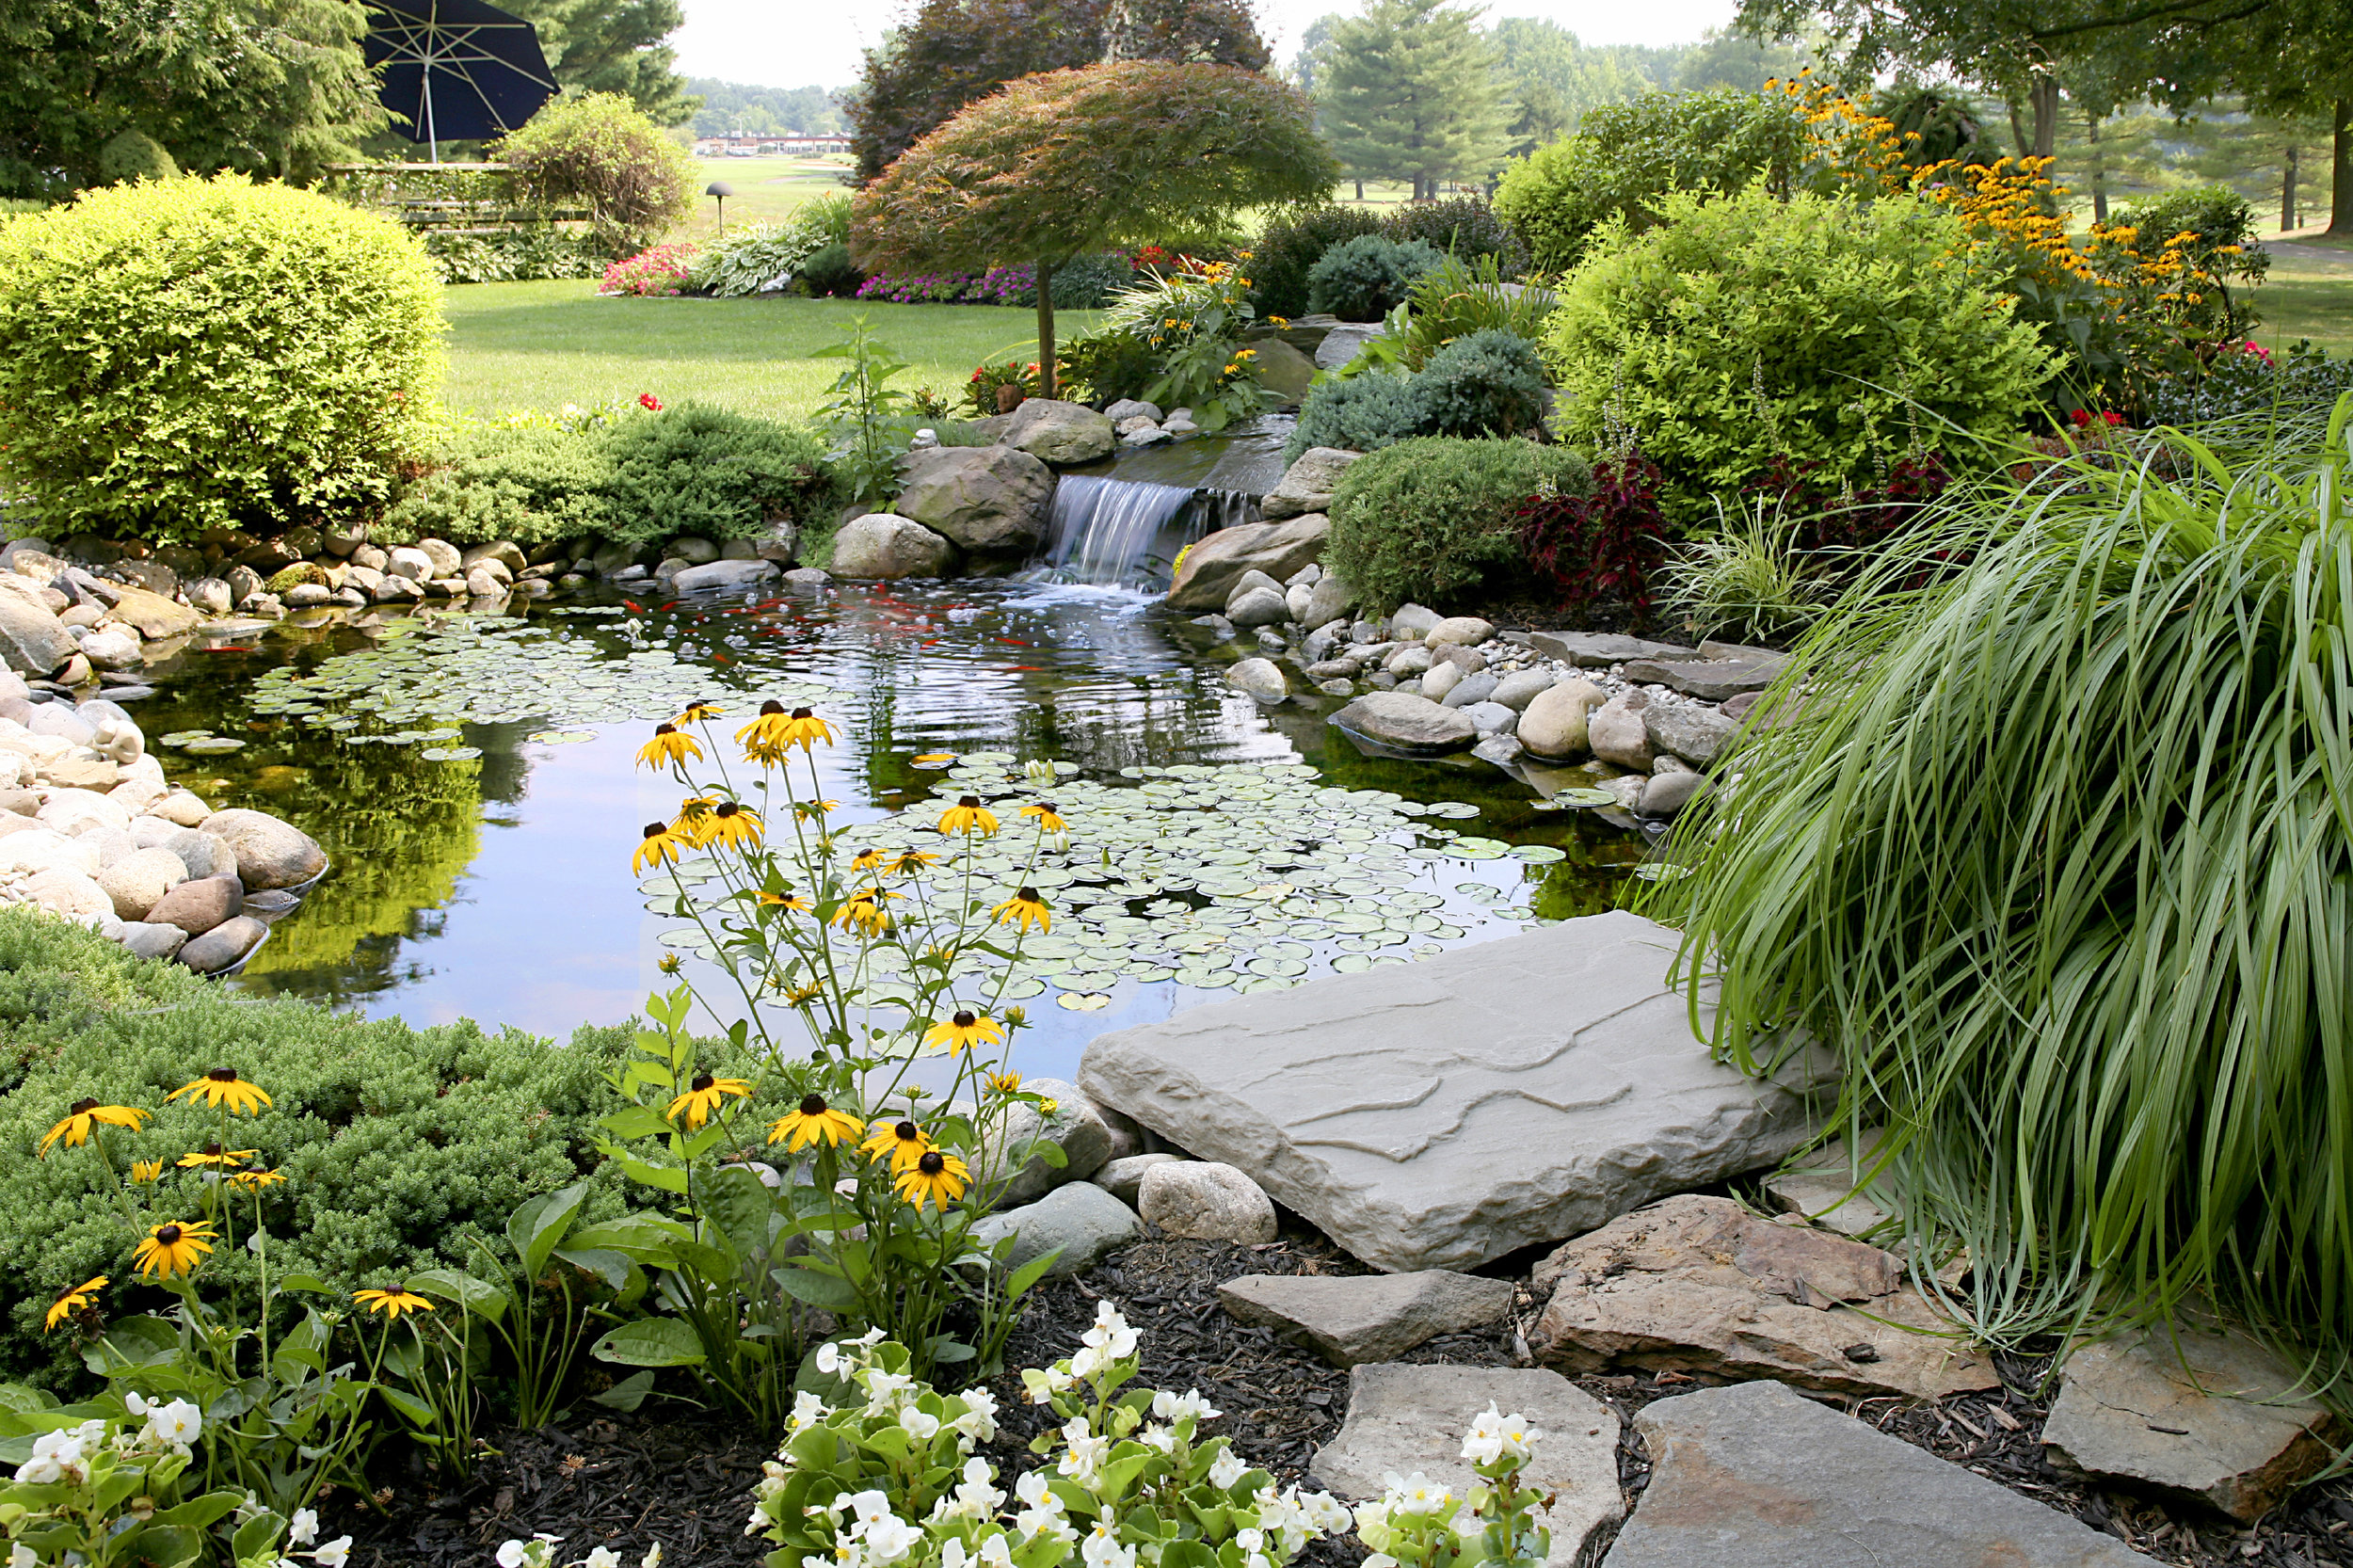 london-ontario-landscaper-pool-pond-design-garden-company-hunter-home-garden-04.jpg